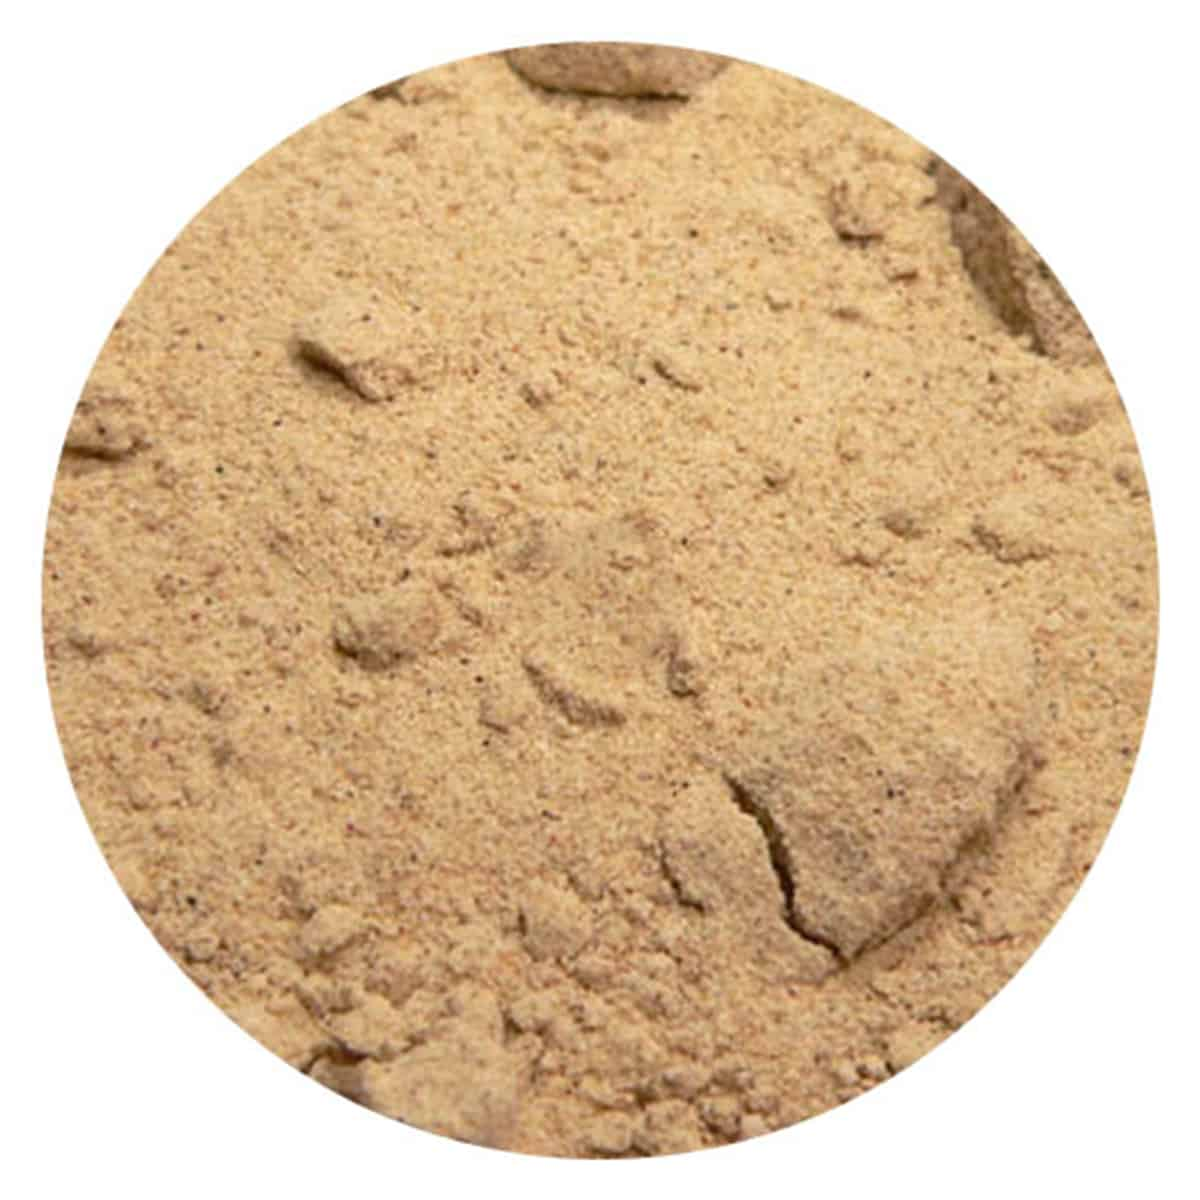 Buy IAG Foods Asafoetida Powder (Hing Powder) - 1 kg